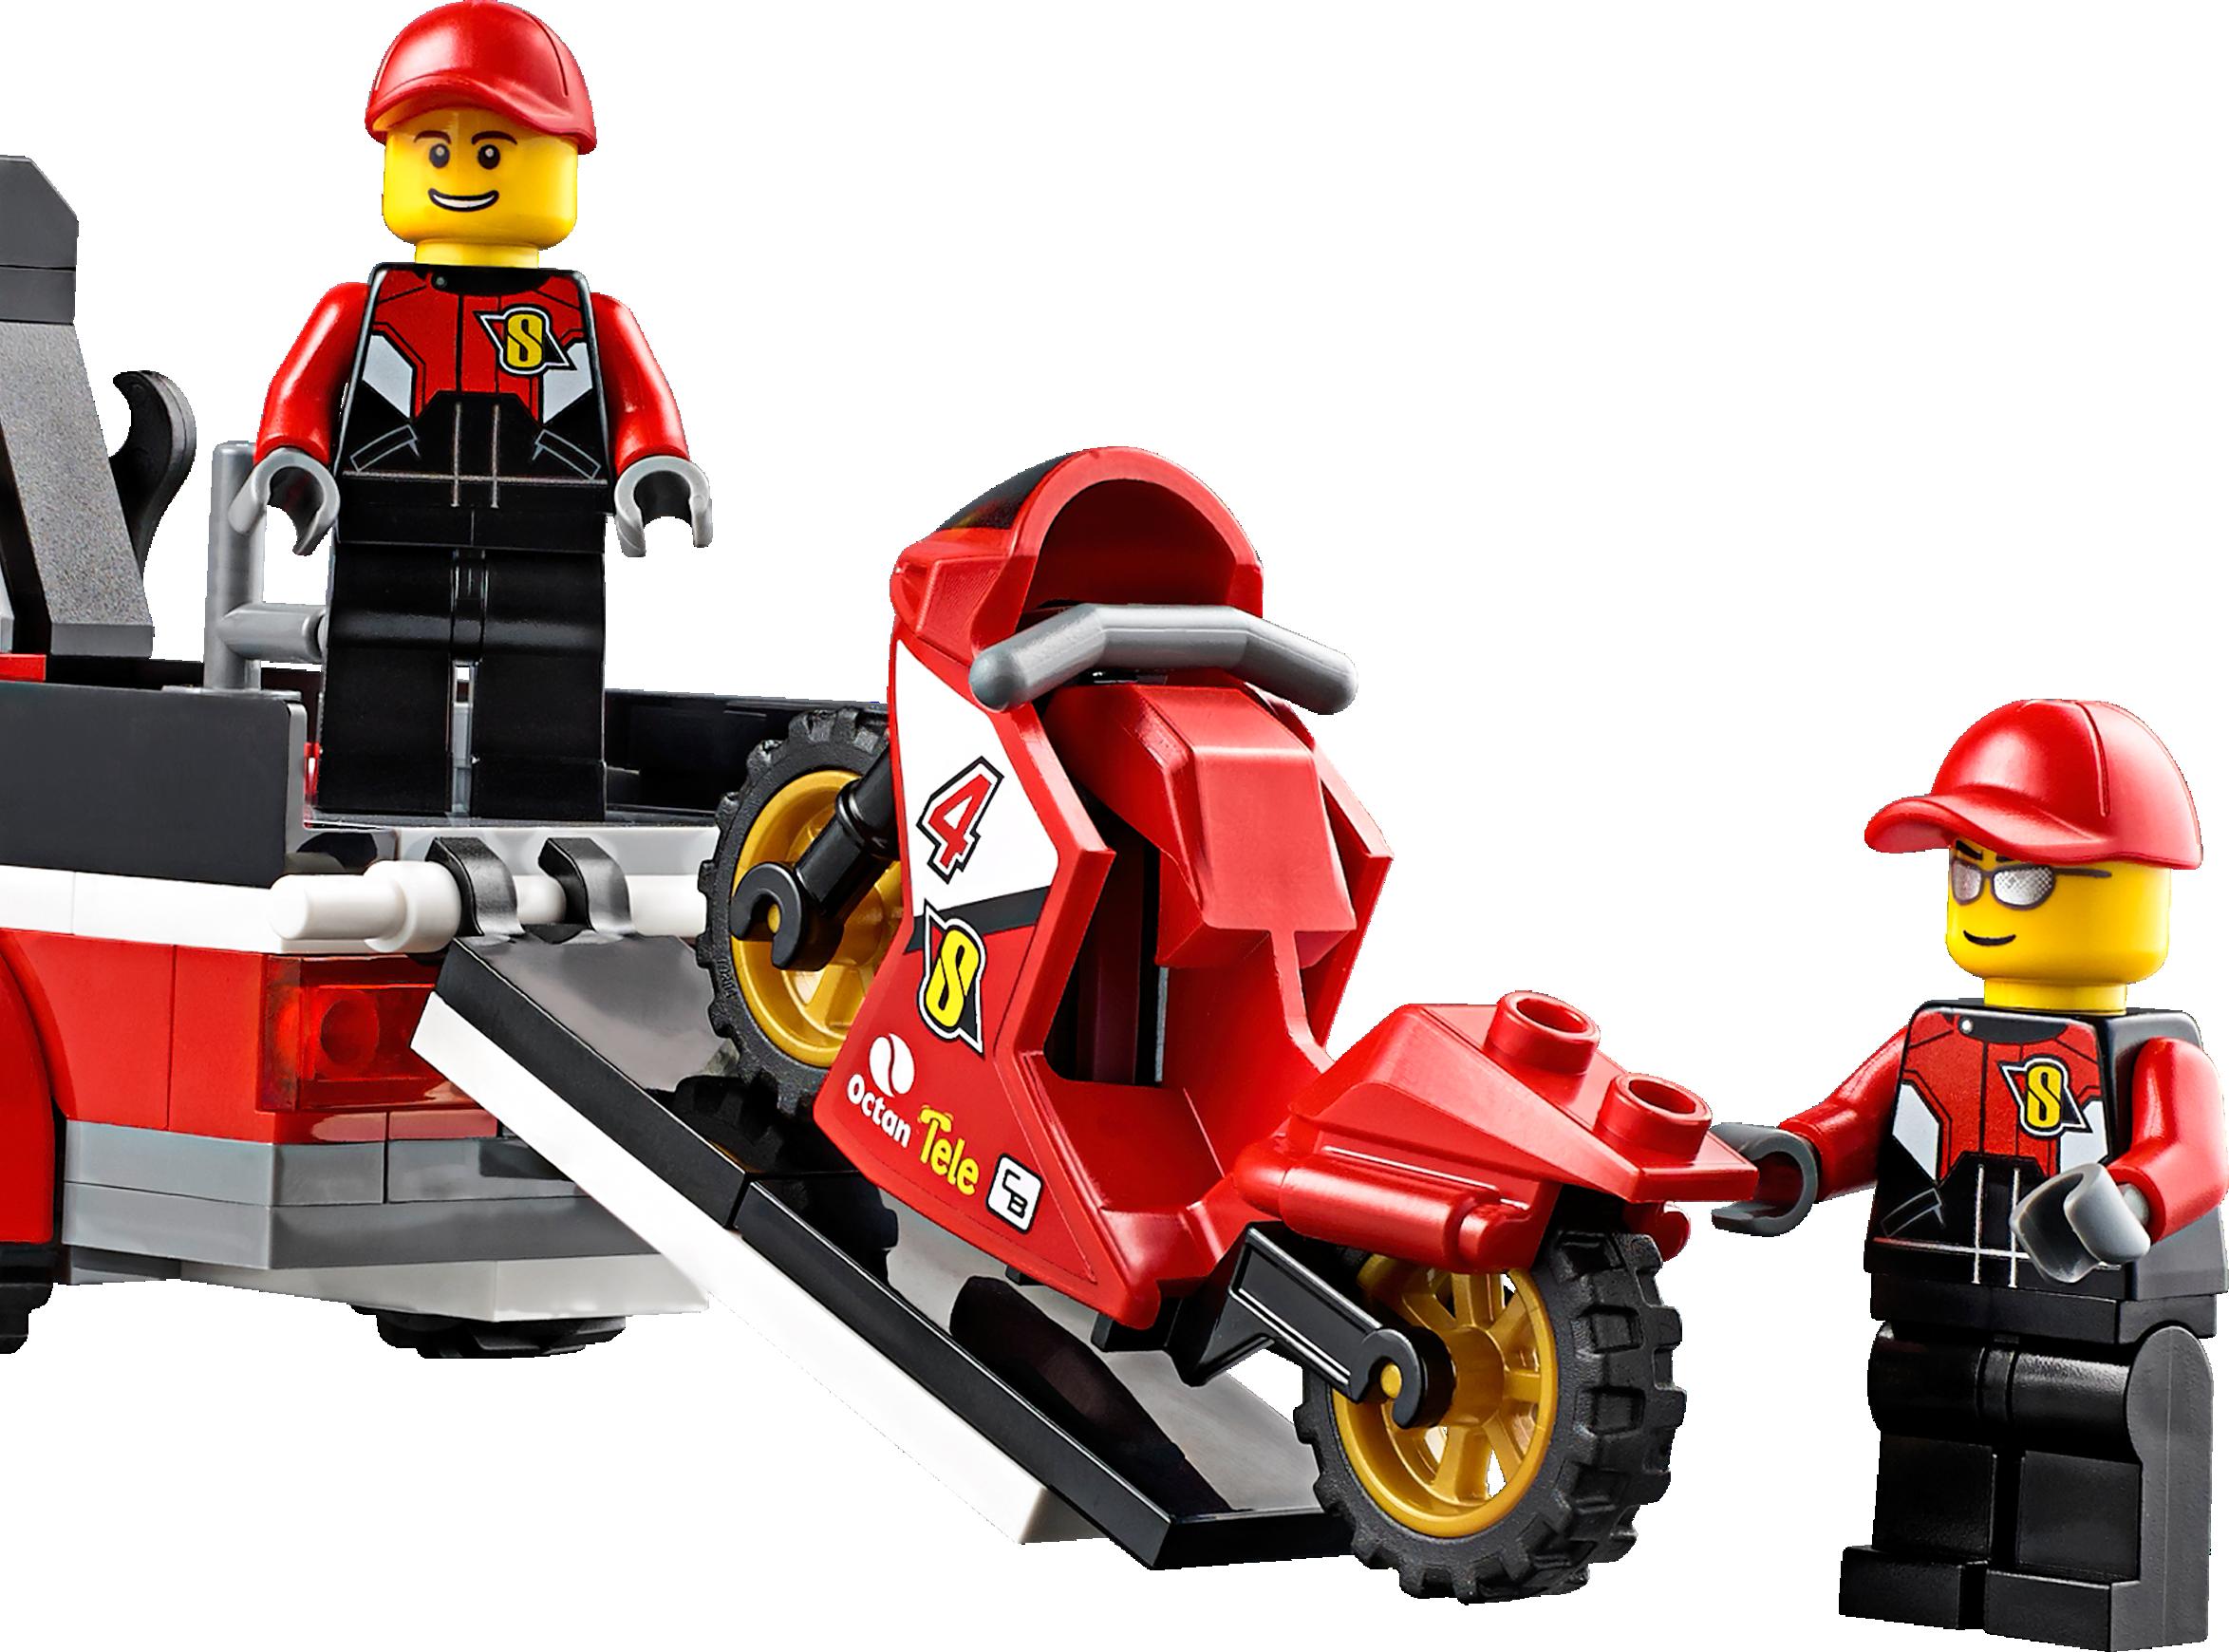 Racing Bike Transporter